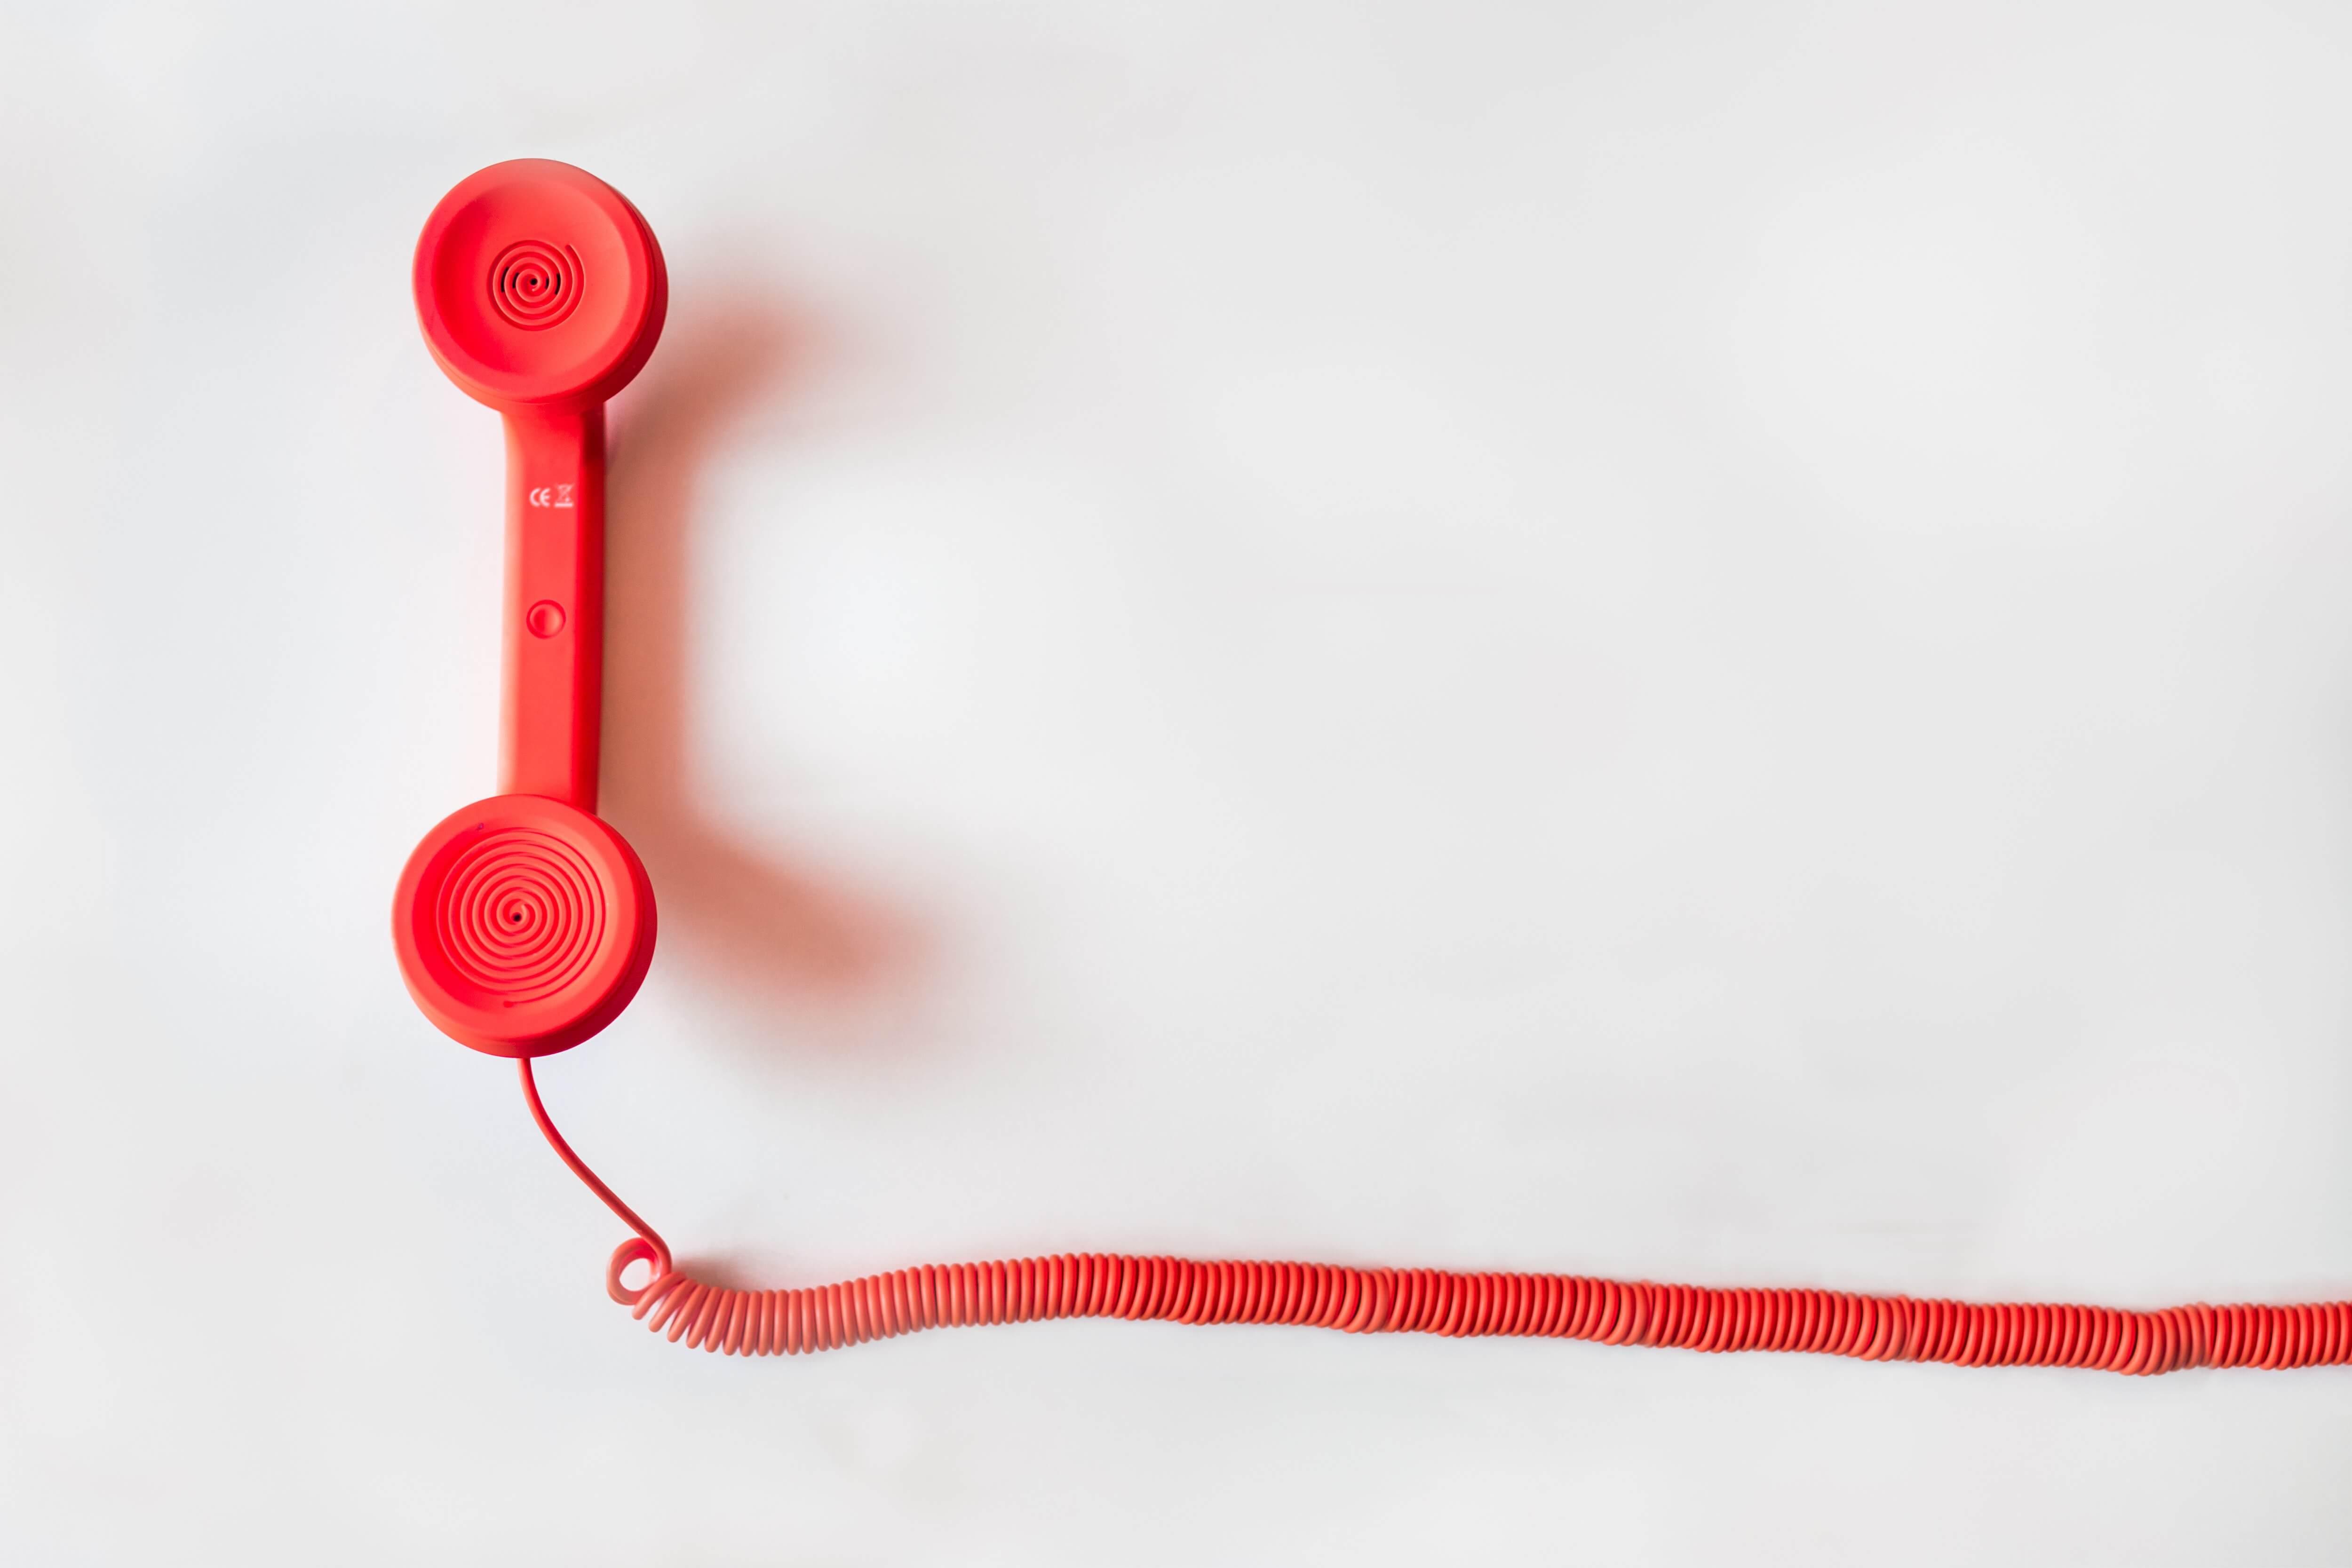 Missed Calls are Missed Opportunities